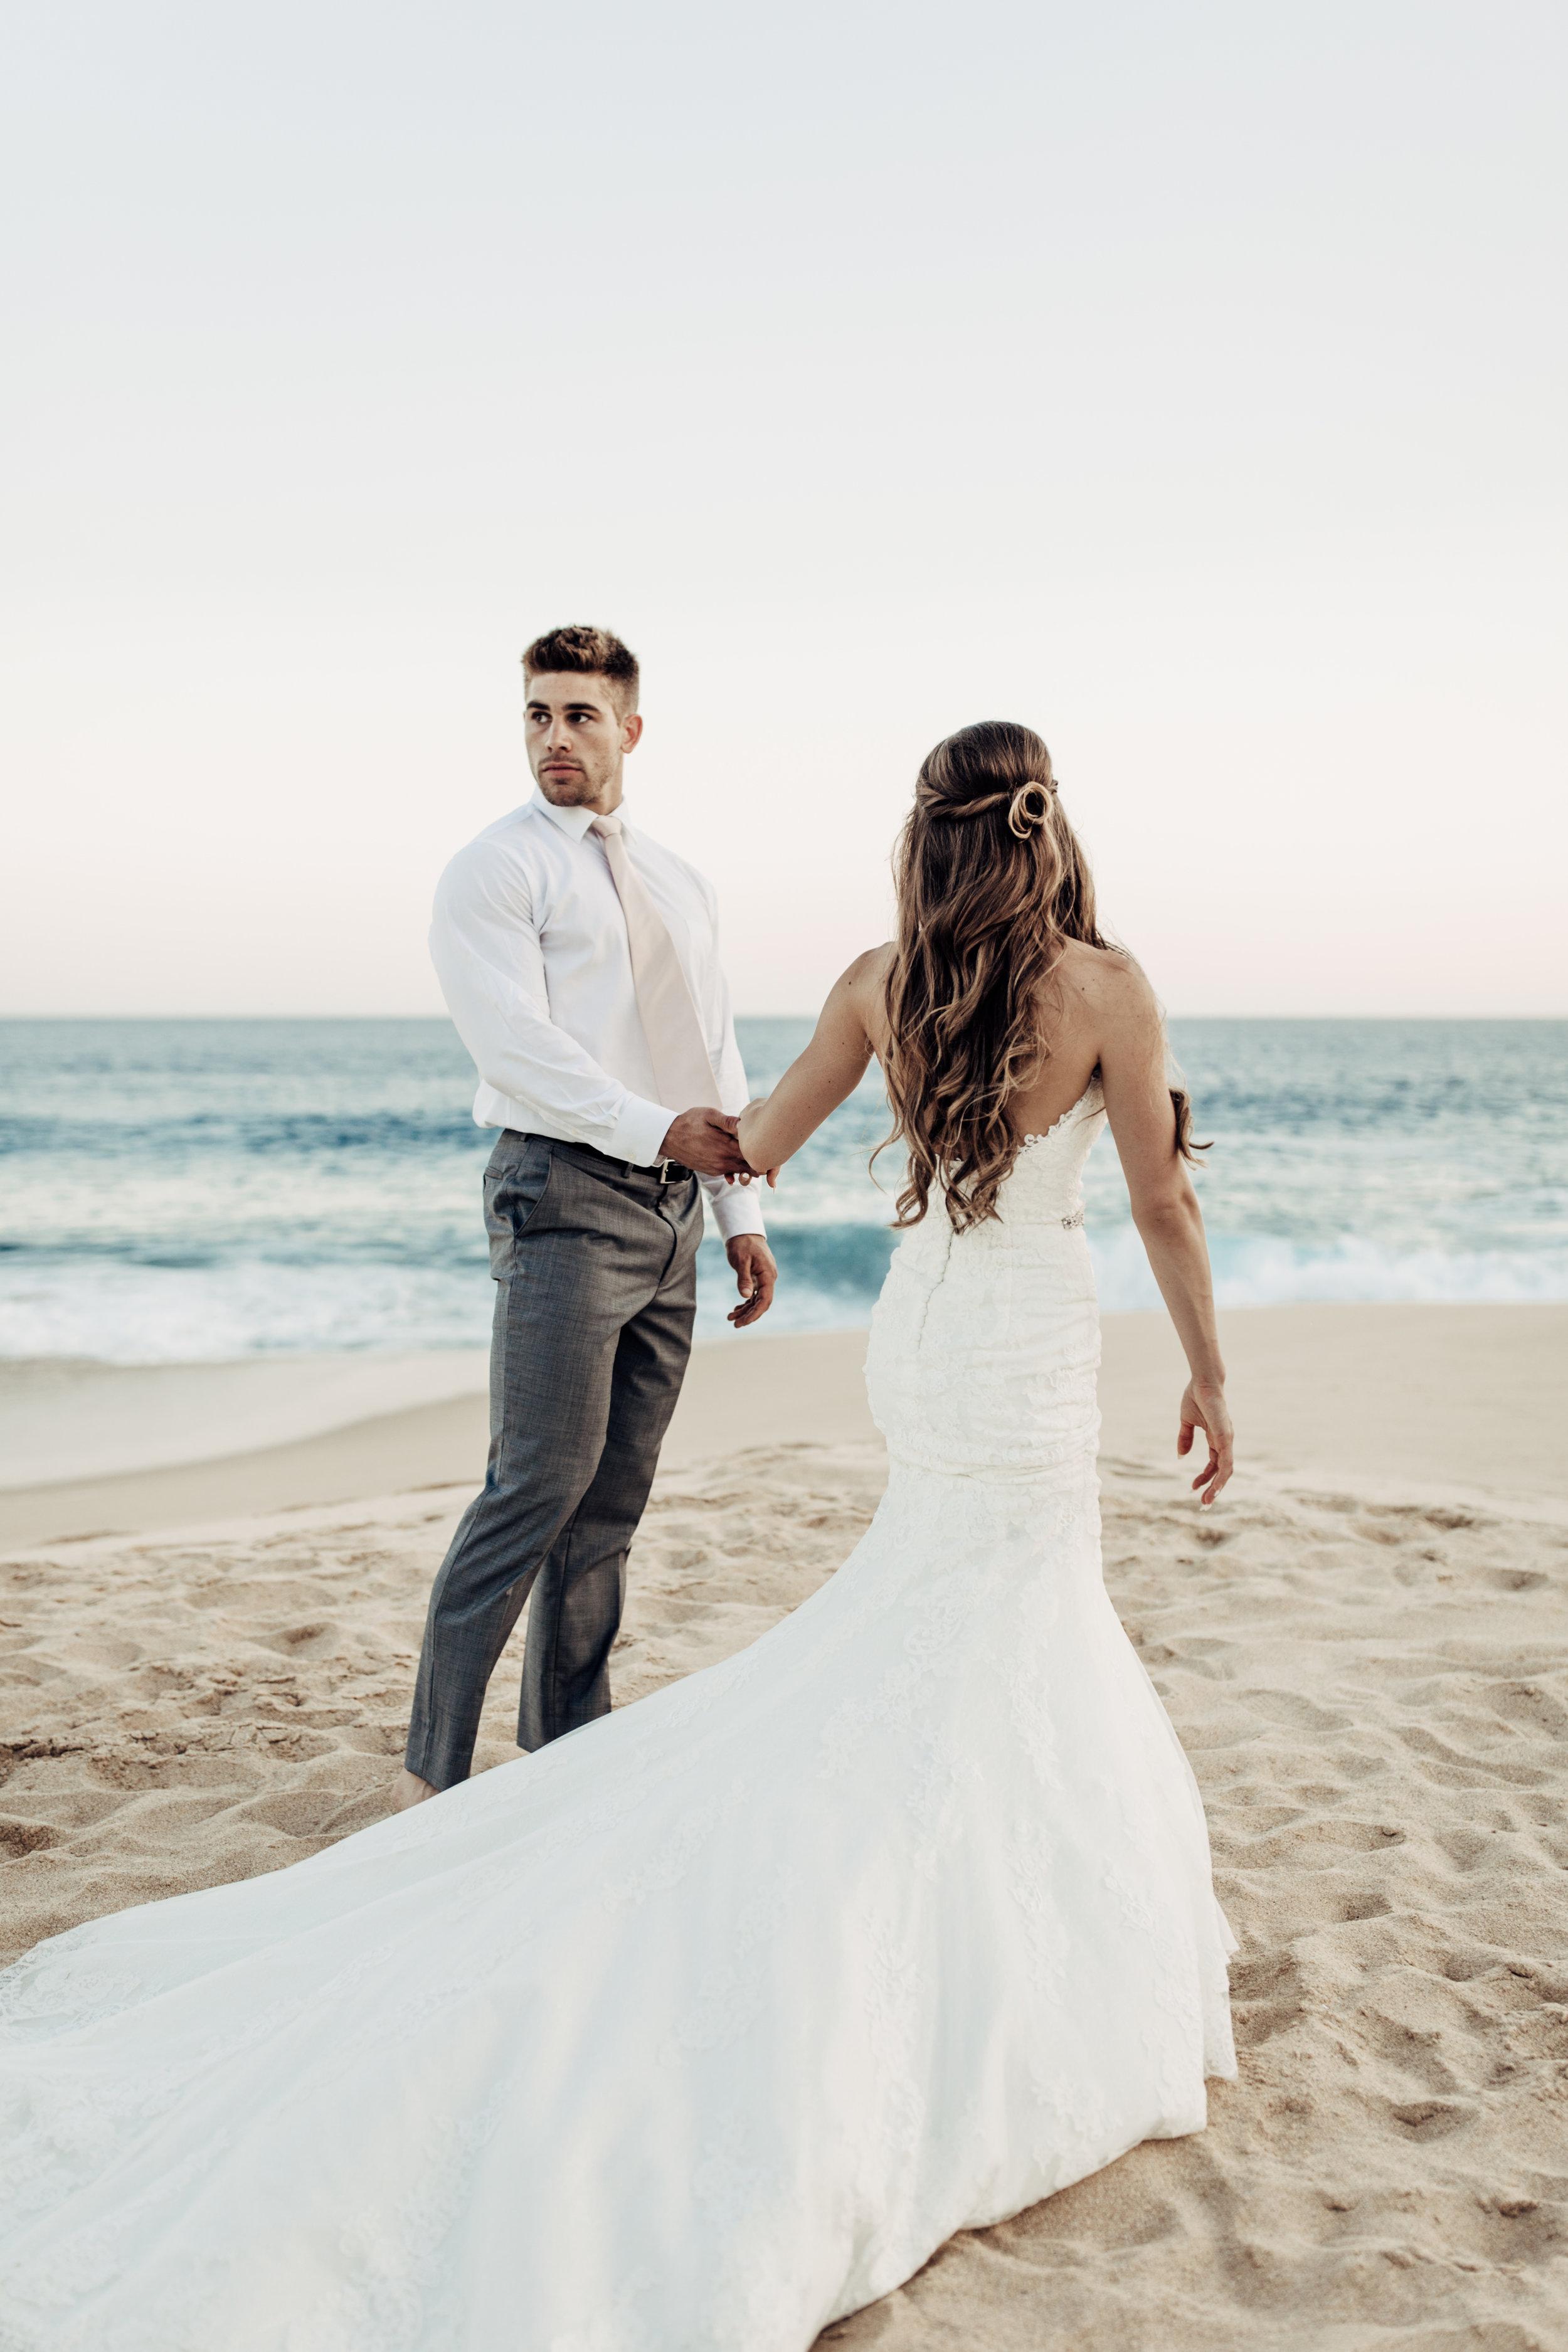 pueblo-bonito-sunset-beach-wedding-cabo-san-lucas515.jpg